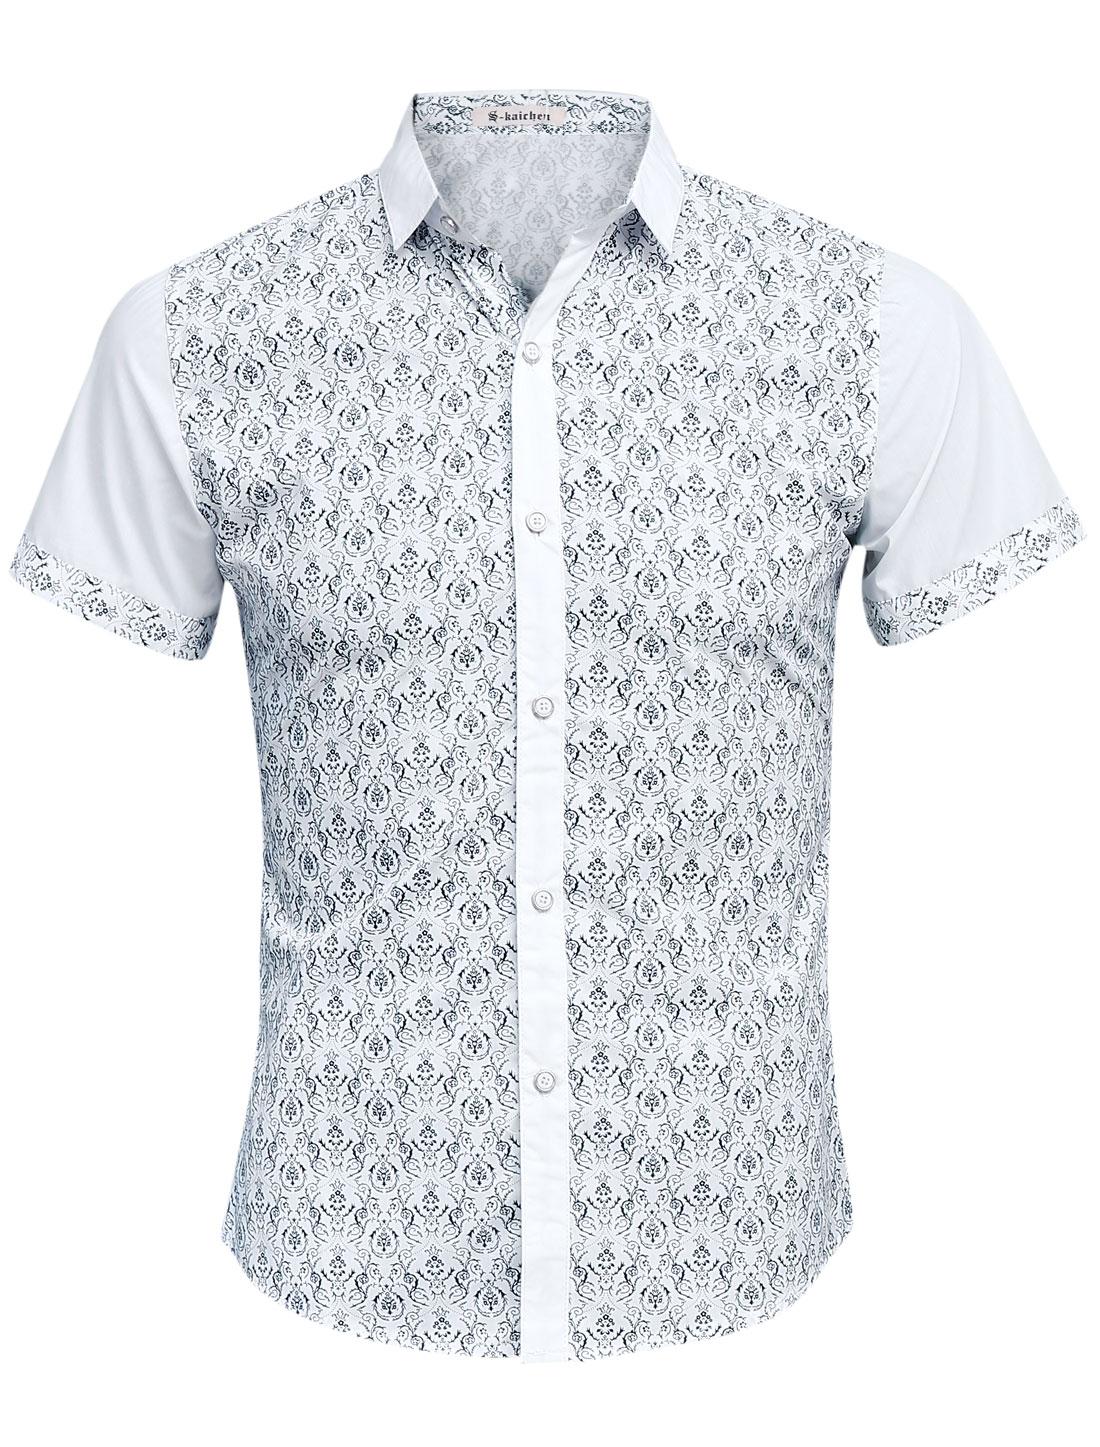 Men Floral Prints Short Sleeve Panel Design Slim Leisure Shirt White S